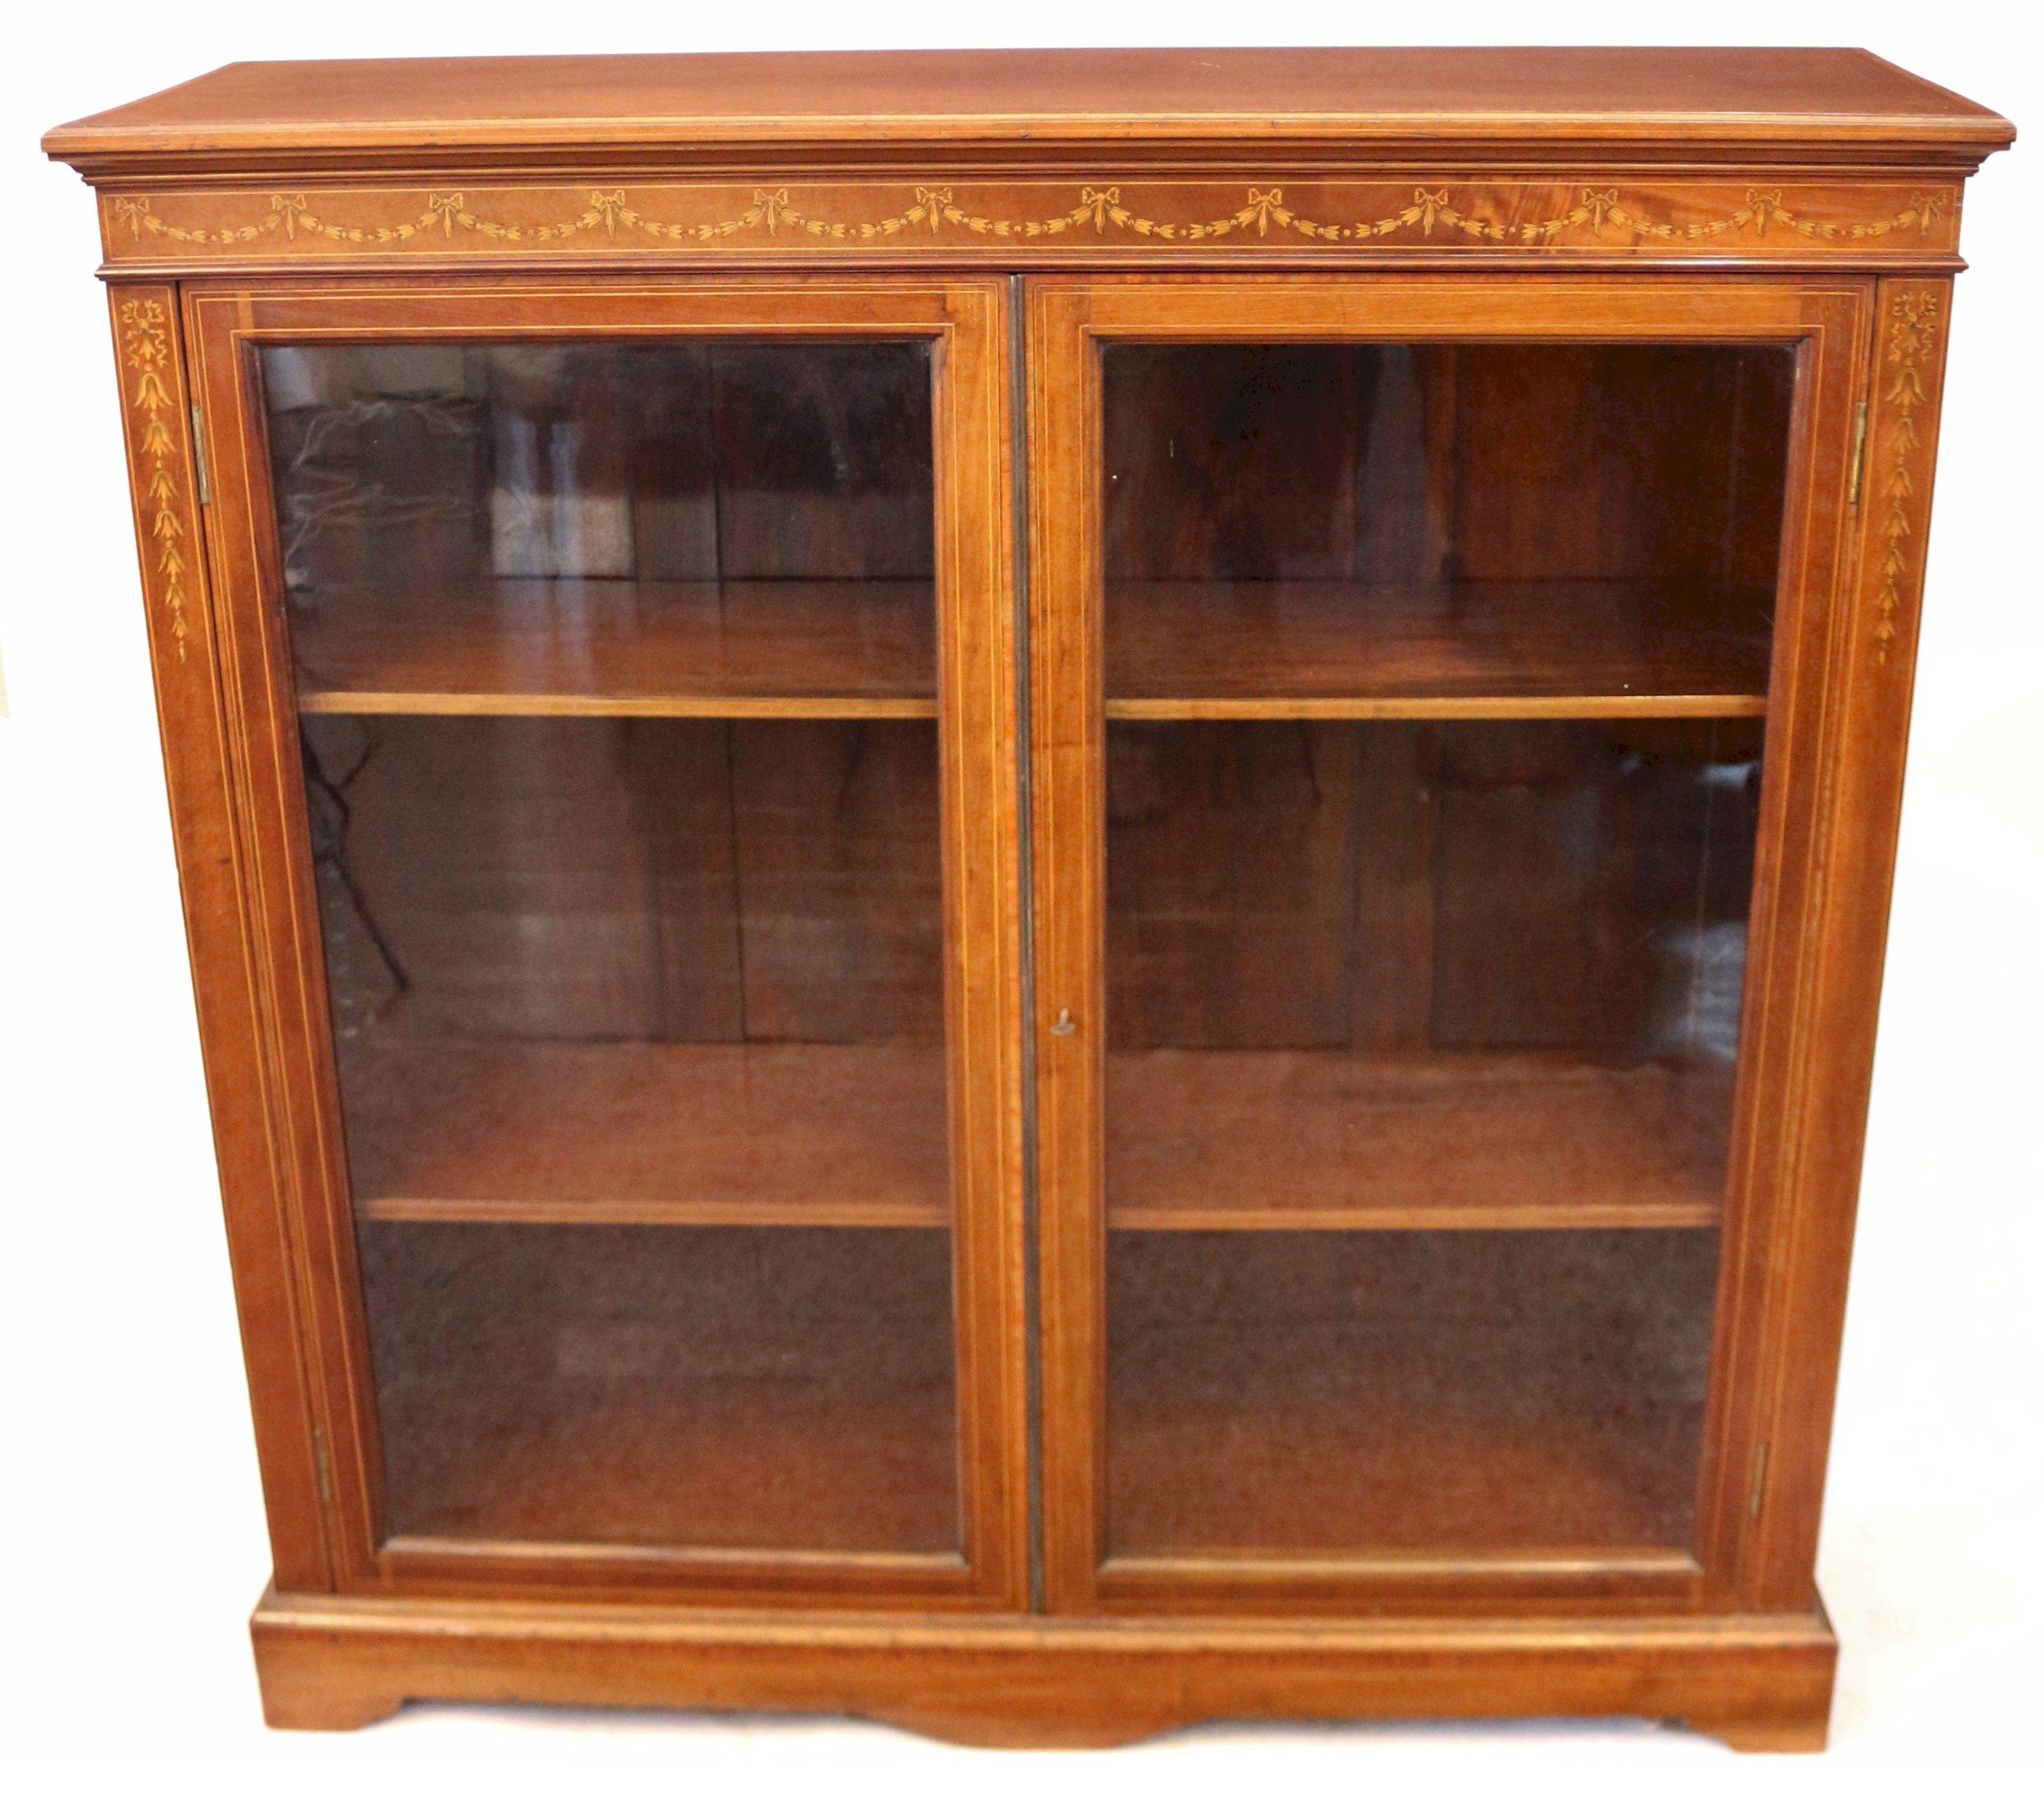 Edwardian Inlaid Mahogany 2 Door Cabinet Bookcase